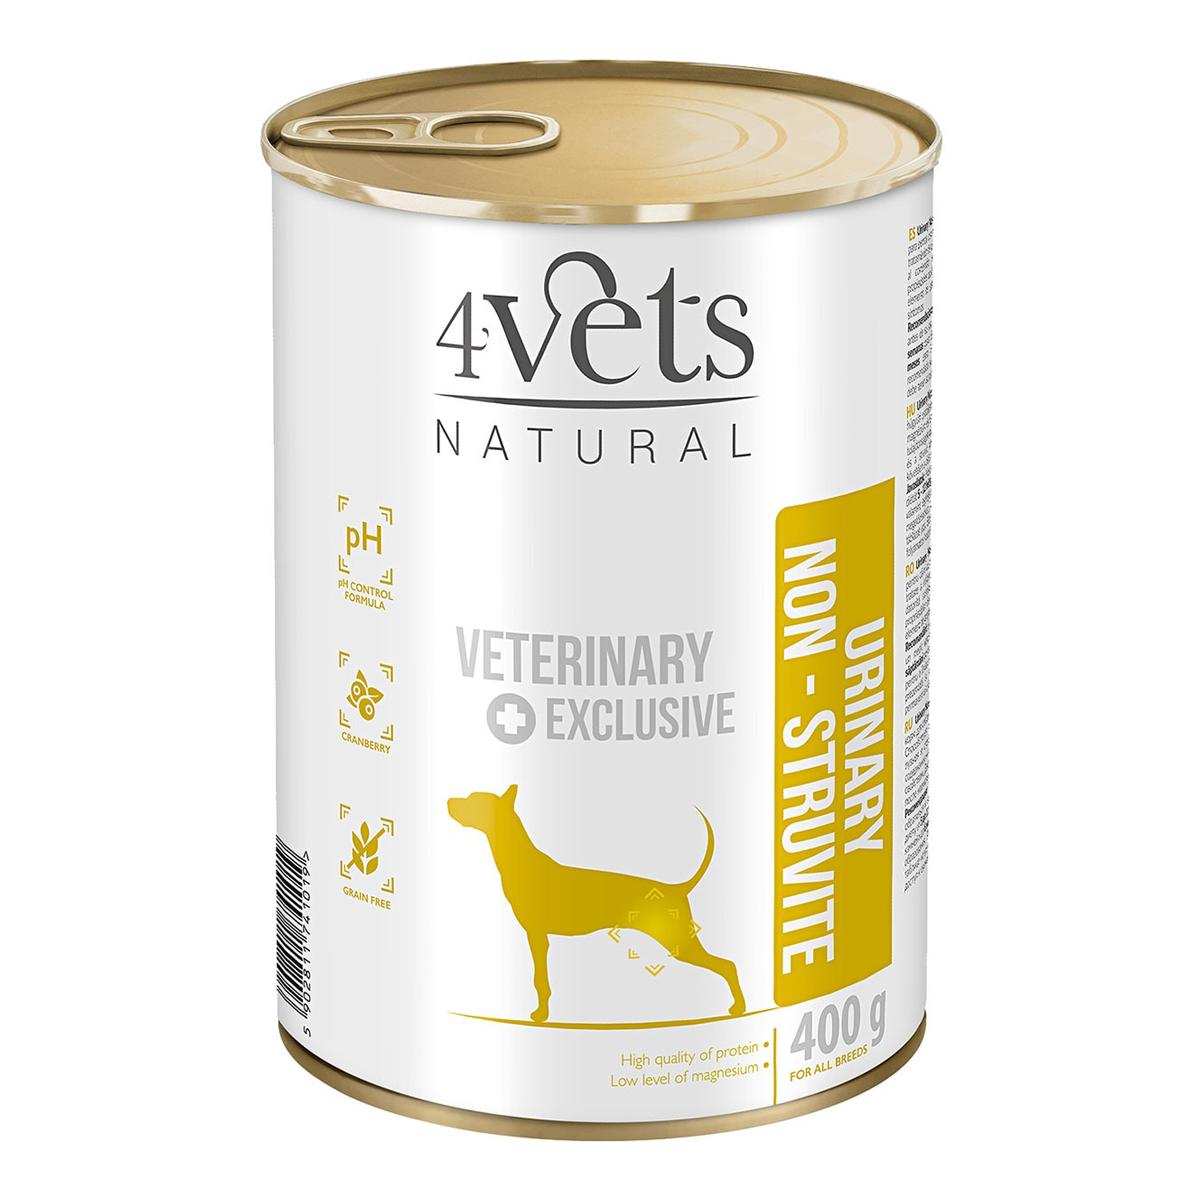 Comida para perros con trastornos del tracto urinario Urinary Non-Struvite 4vets natural